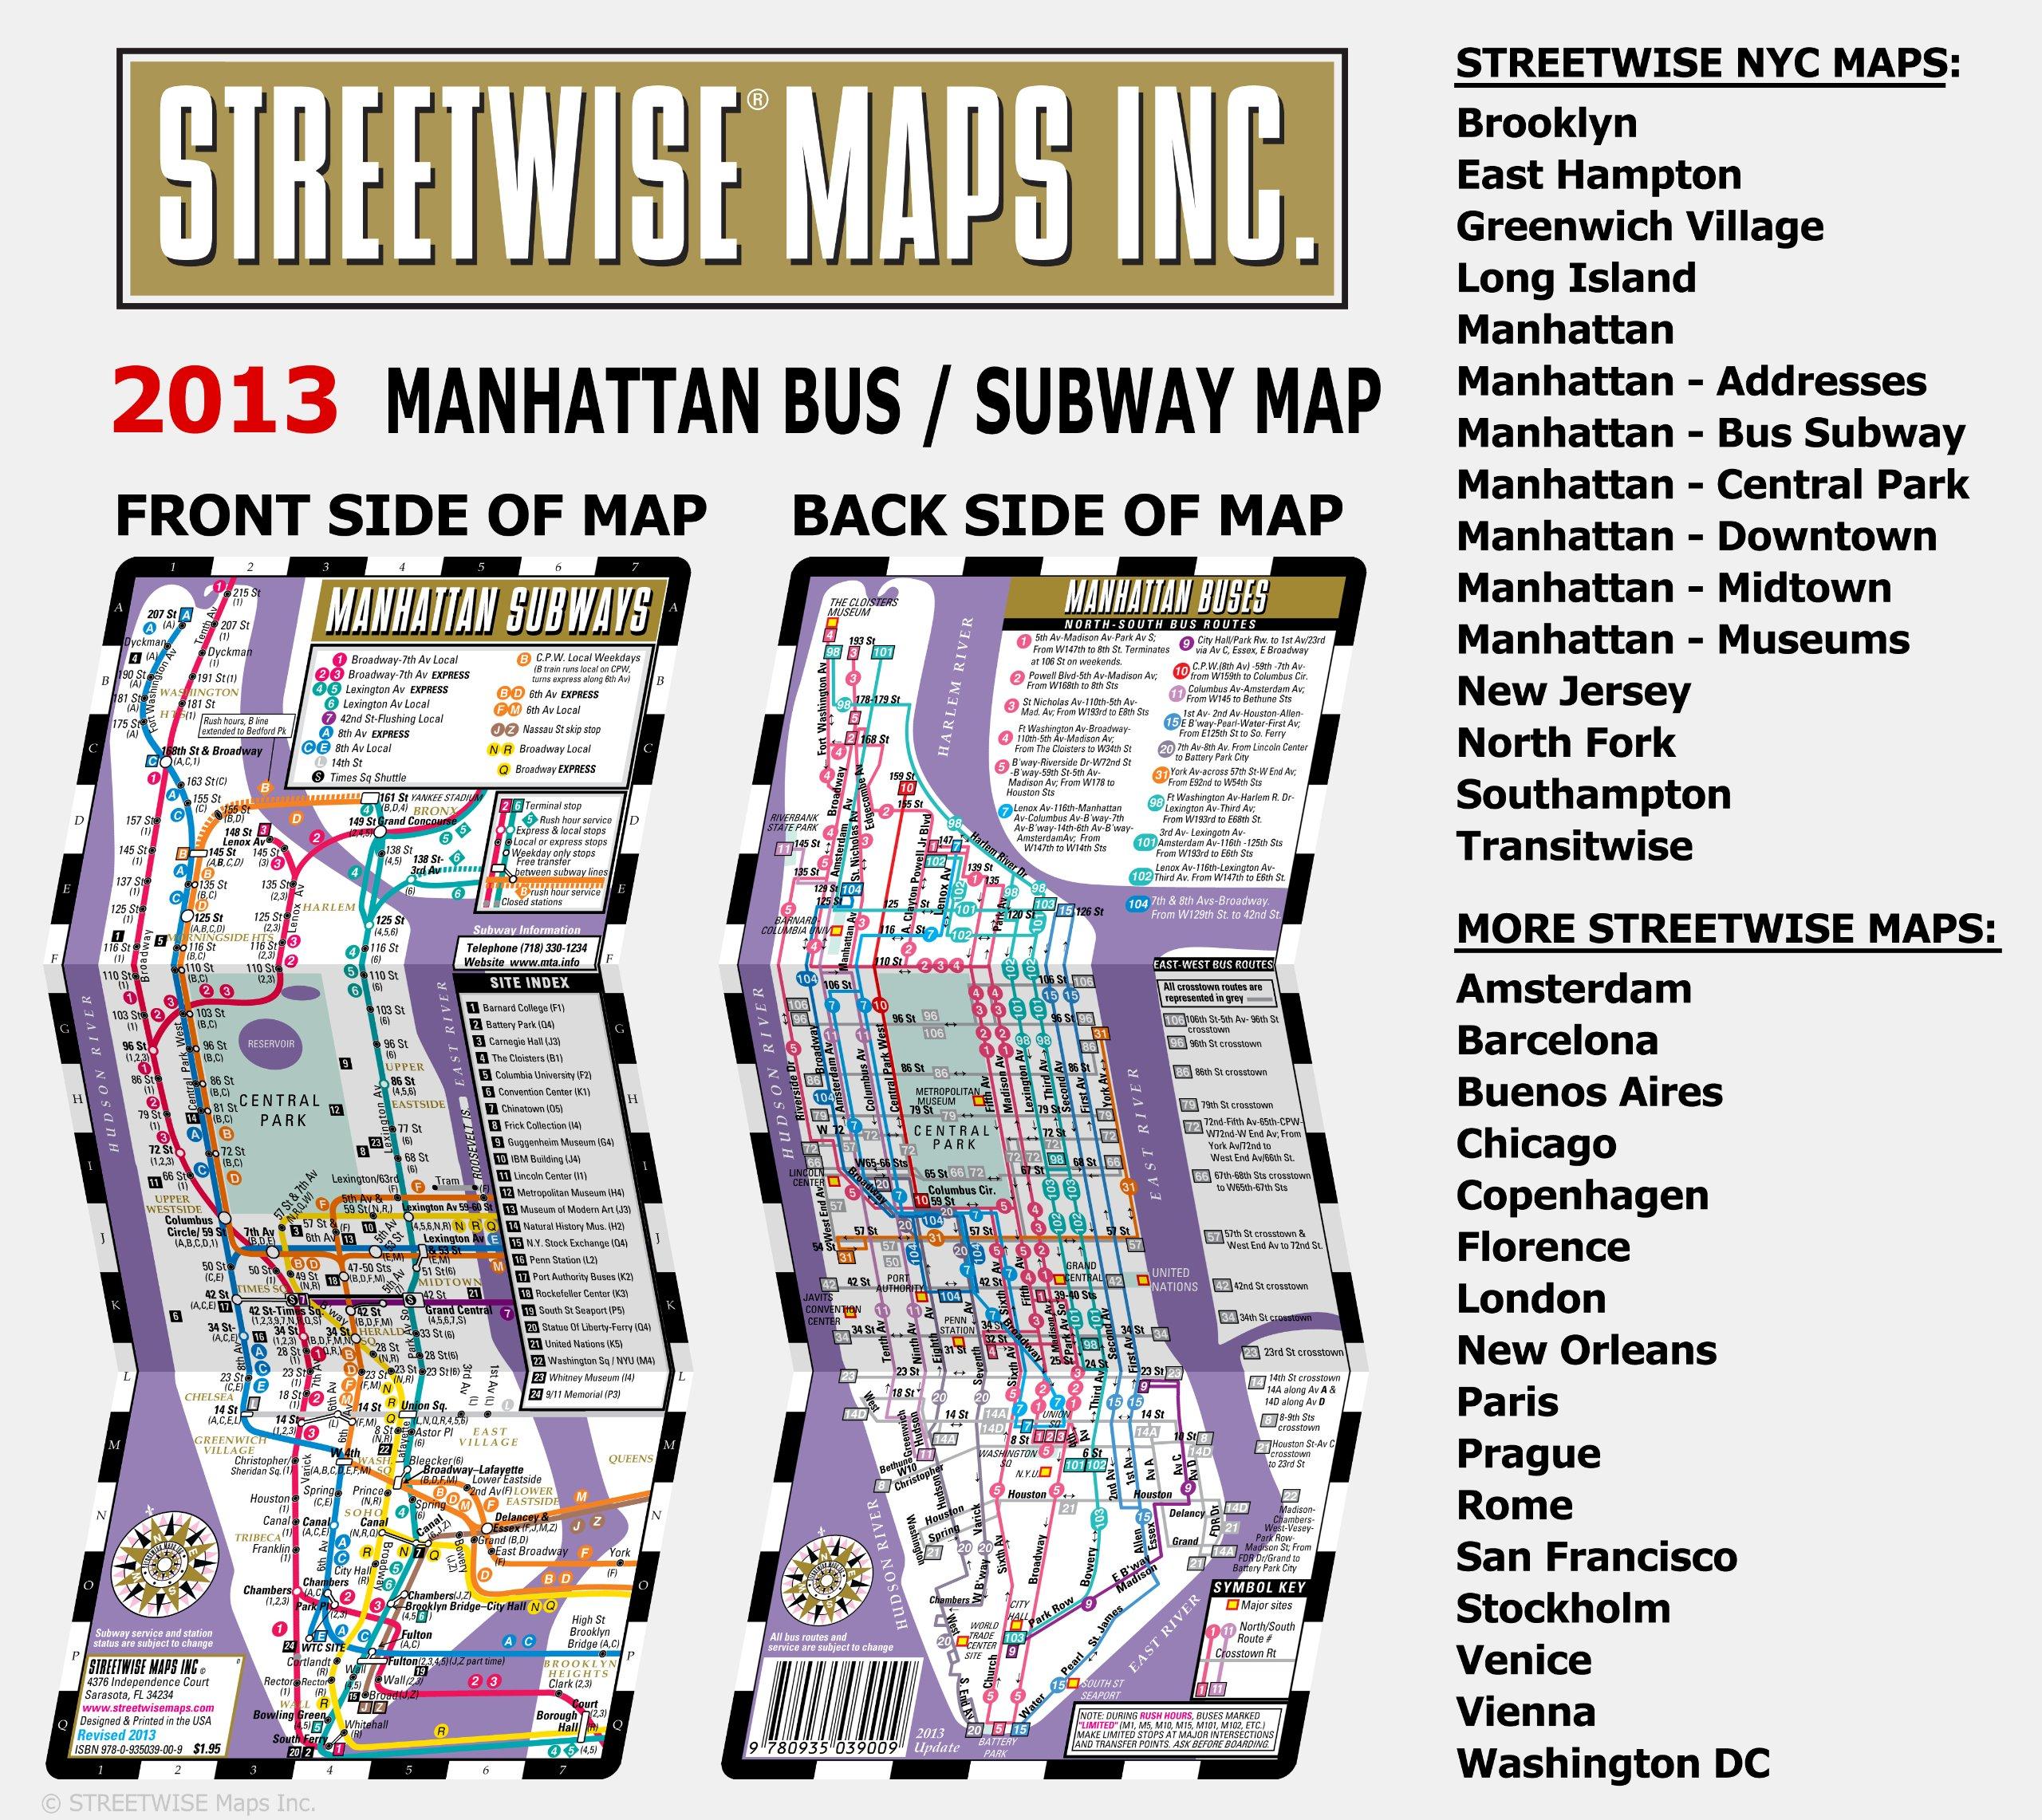 Nyc Subway Map Upper Manhattan.Streetwise Manhattan Bus Subway Map Laminated Subway Map Of New